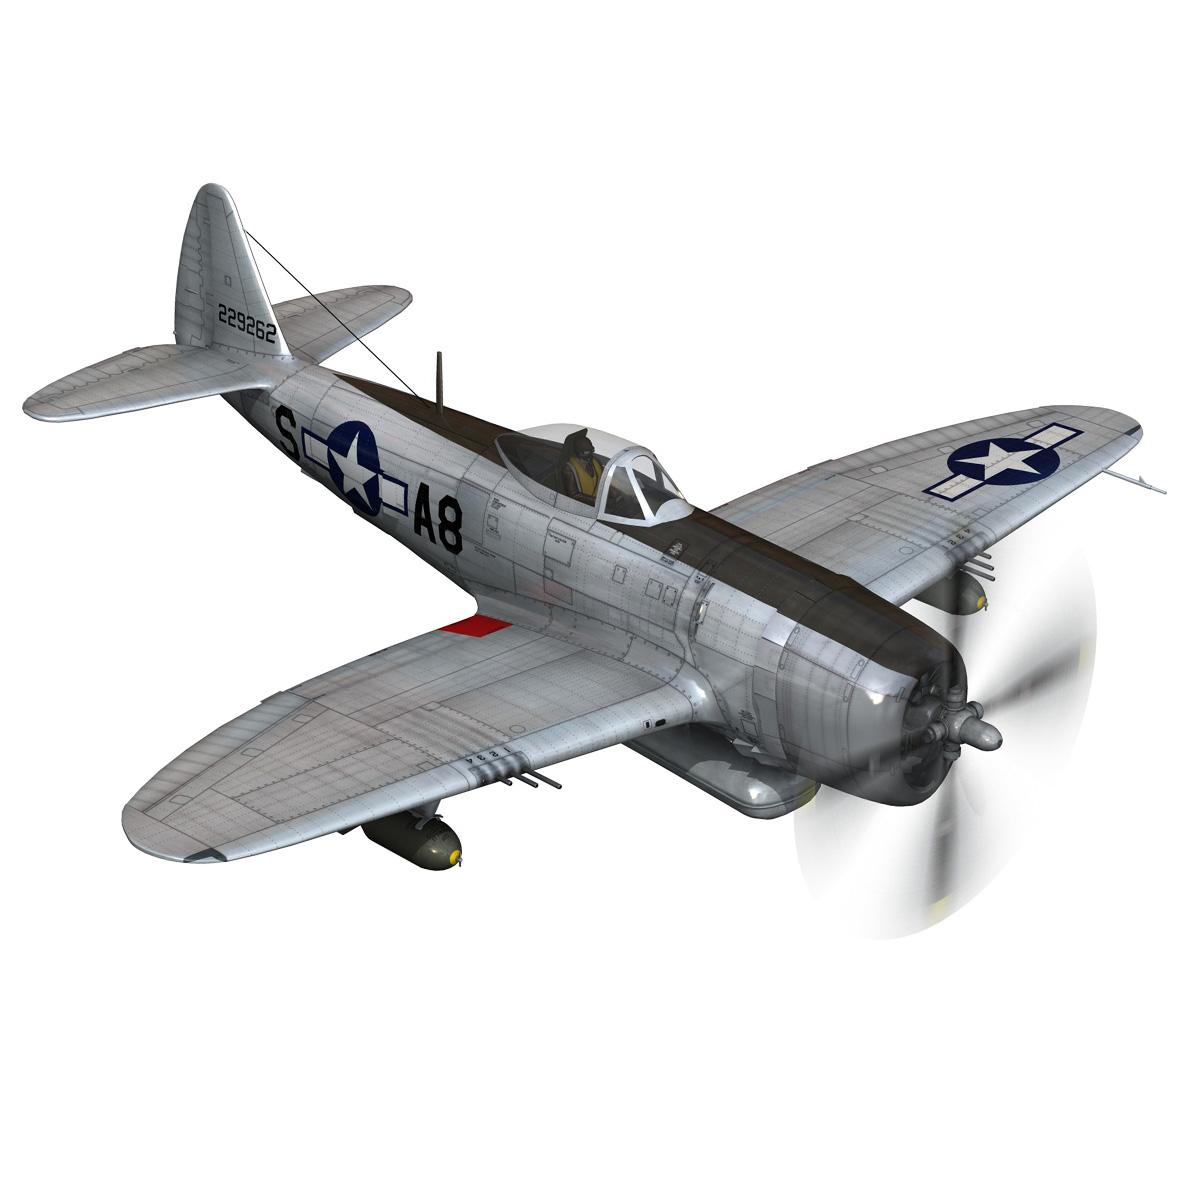 republic p-47 thunderbolt – daddy rabbit 3d model fbx c4d lwo obj 272695